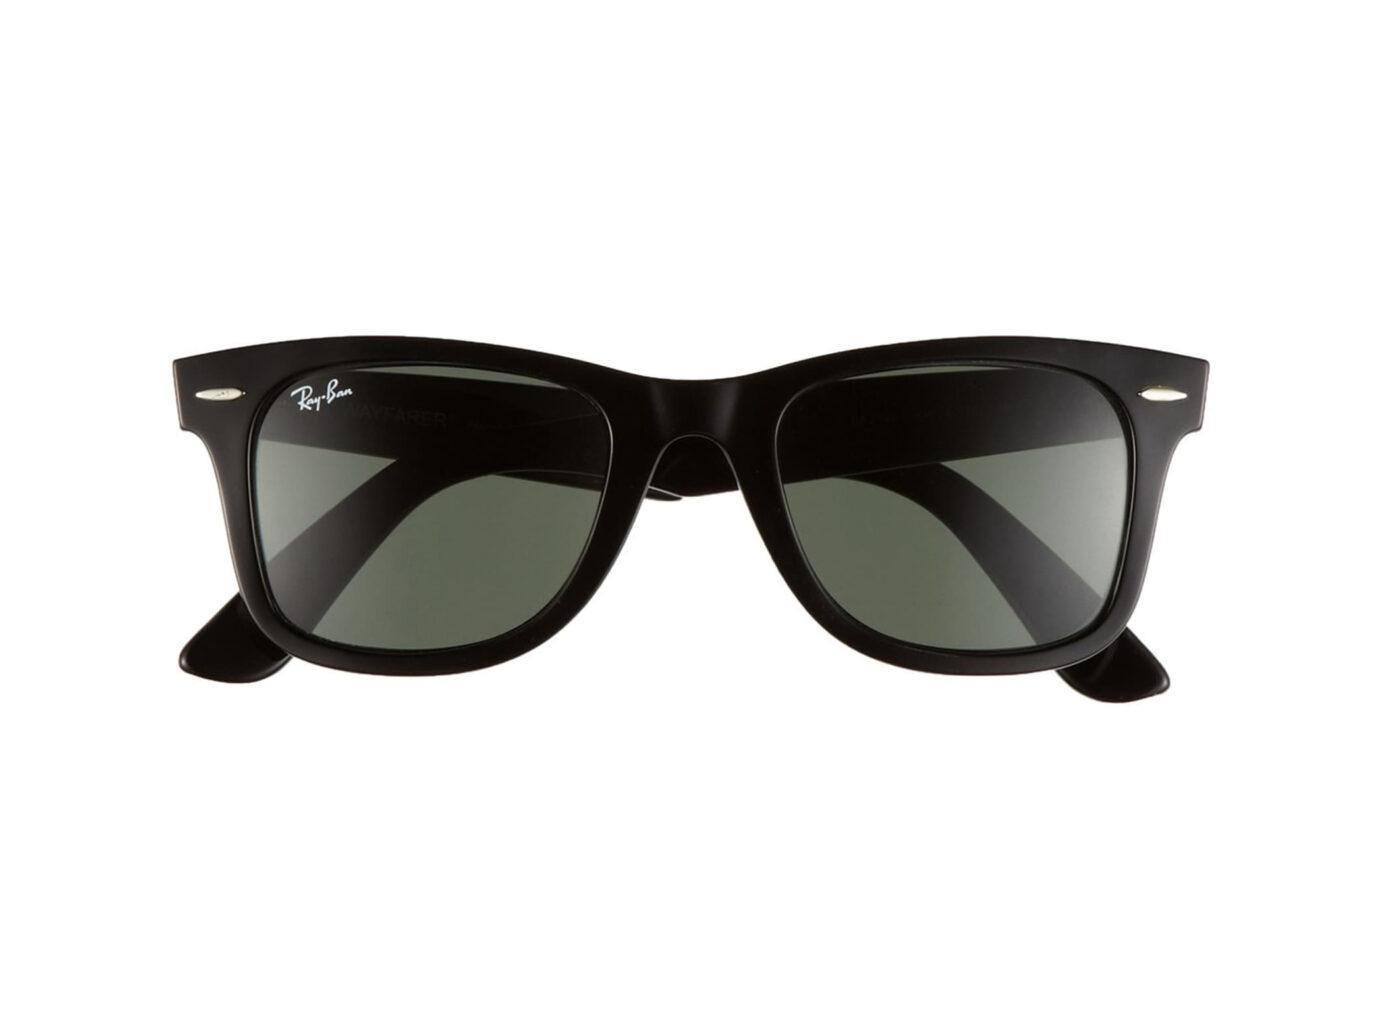 Ray-Ban Classic Wayfarer' 50mm Sunglasses